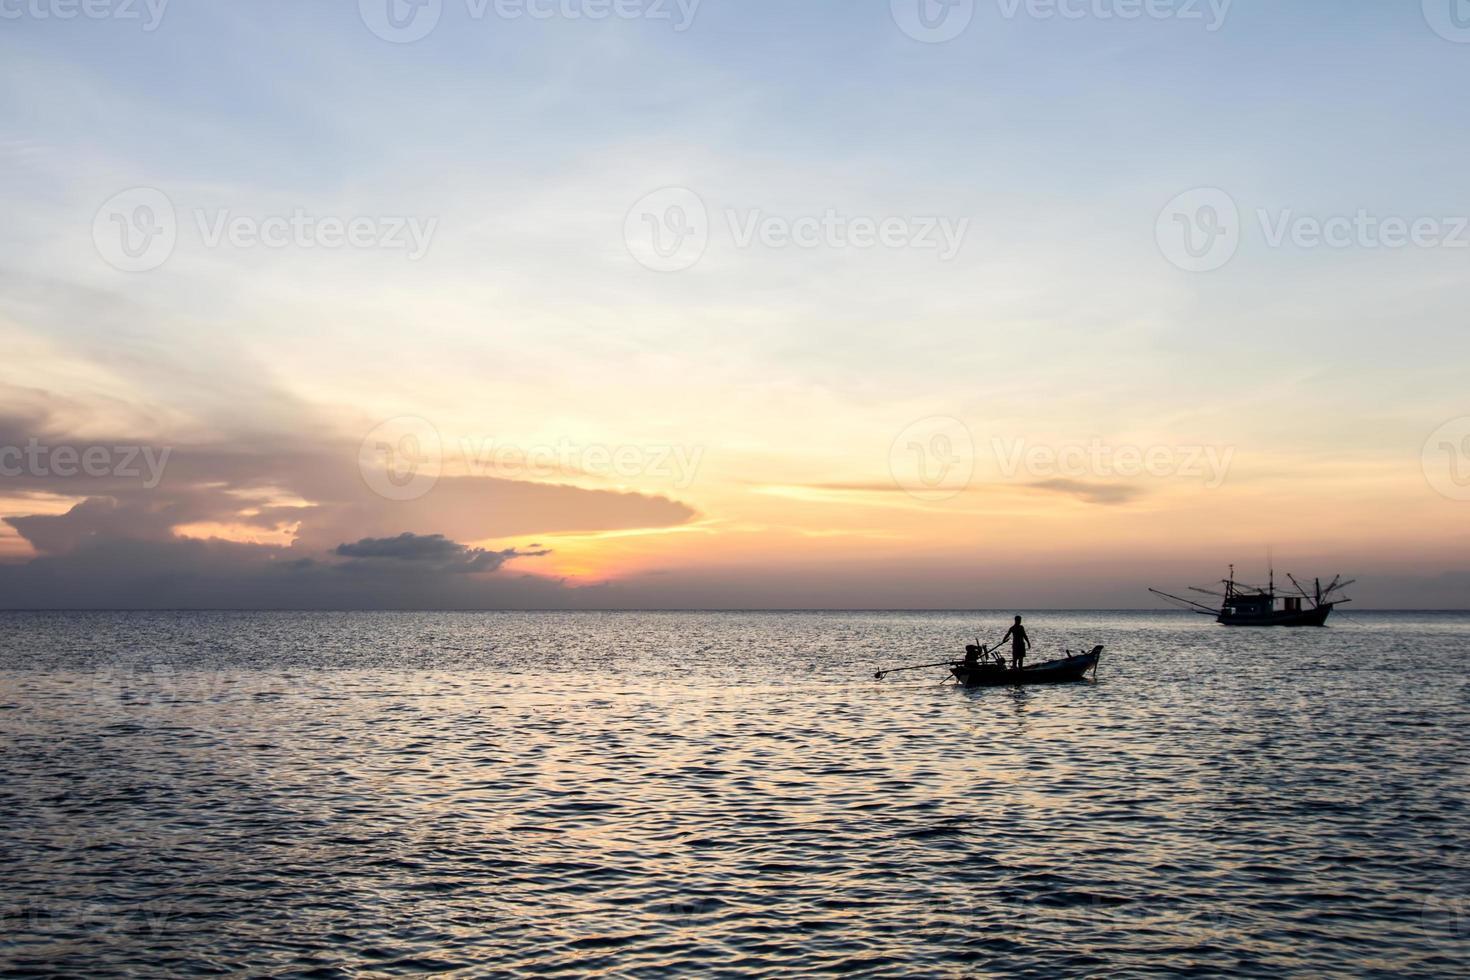 boot met lange staart en zonsondergang op zee, Koh Phangan, Surat Thani foto